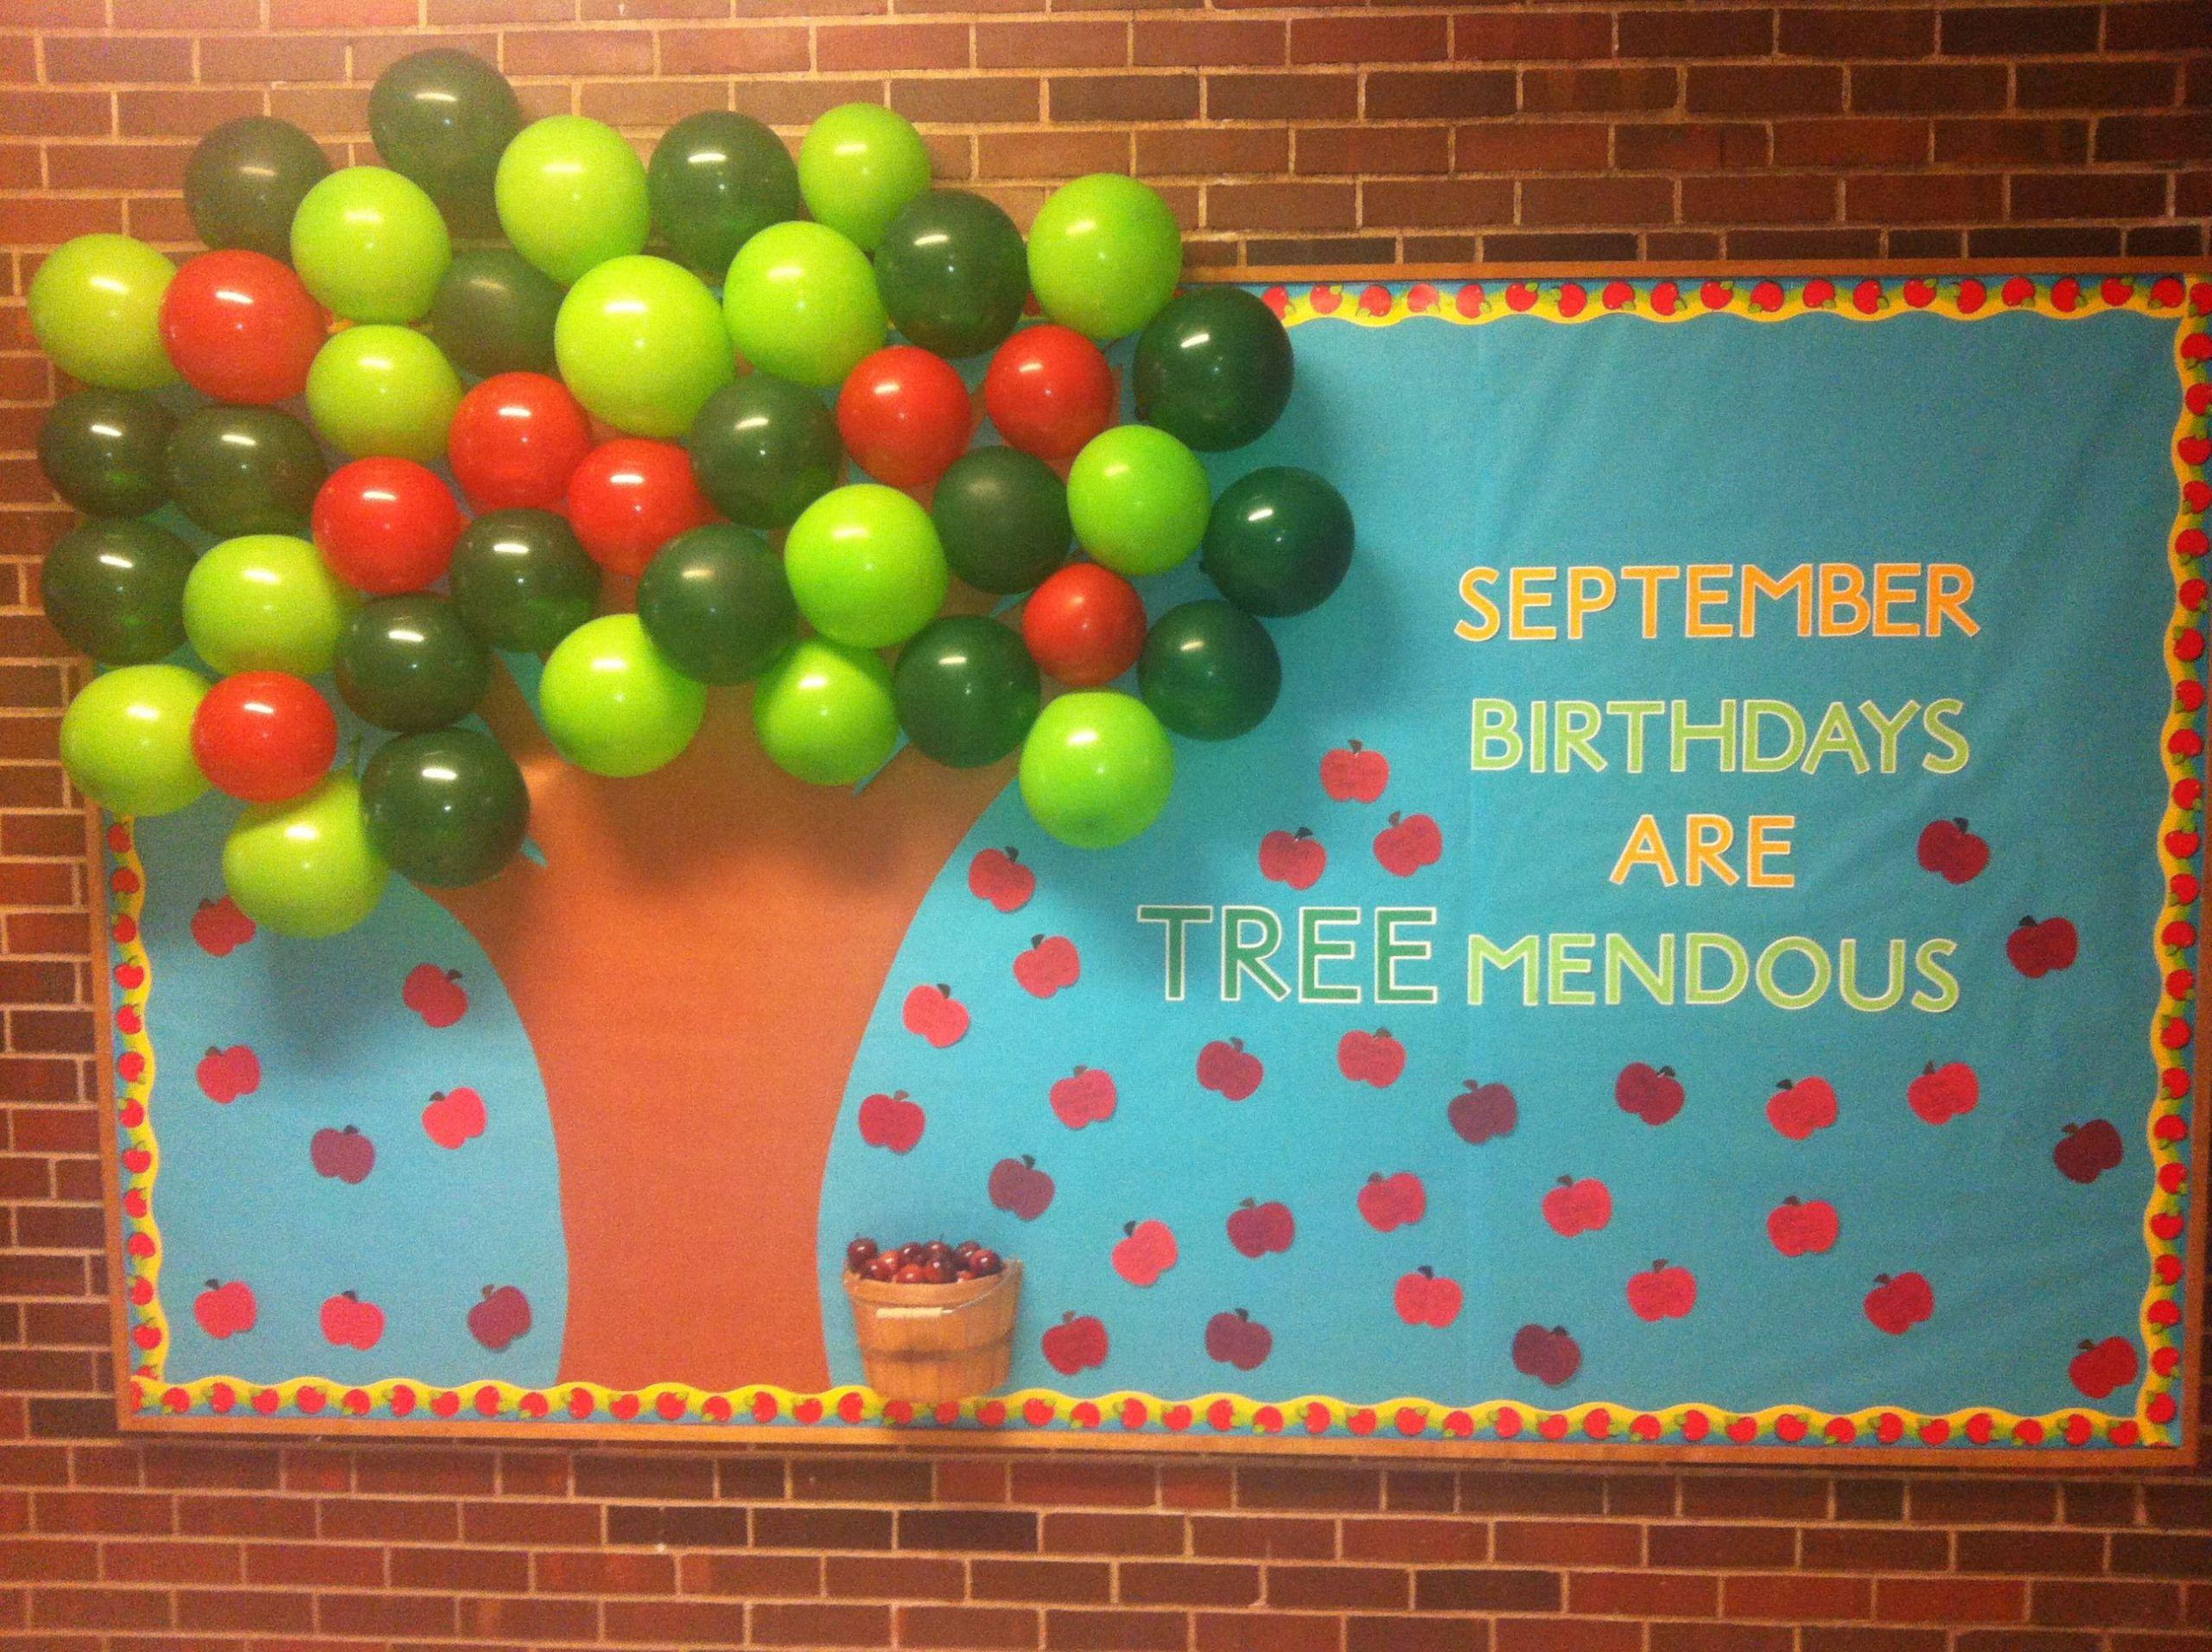 September Birthday Party Ideas  September Birthday Bulletin Board